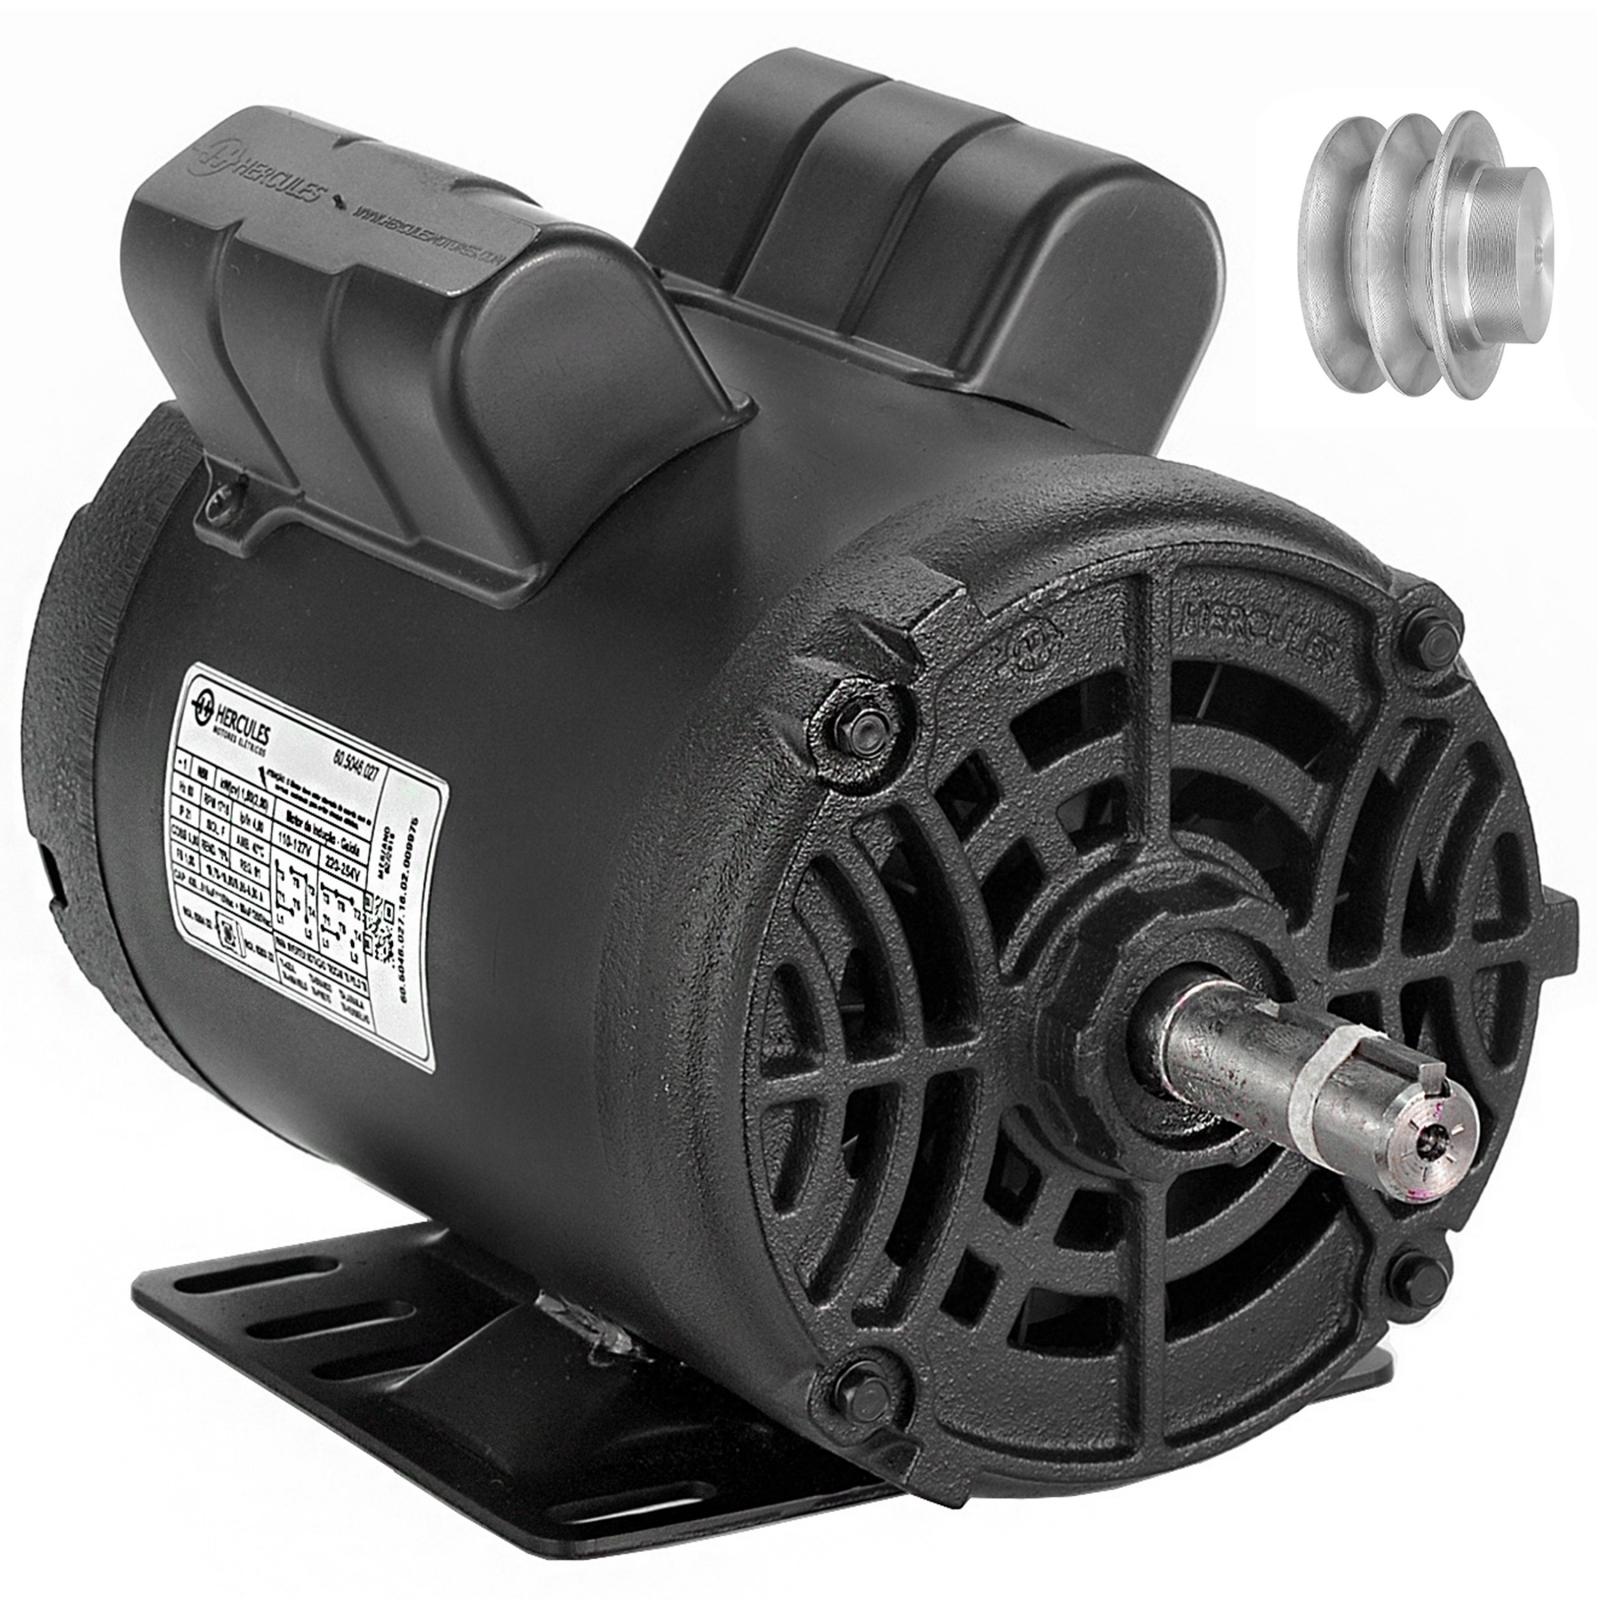 Motor Elétrico Hercules Motores 2cv 4 Polos Monofásico - Ferramentas MEP